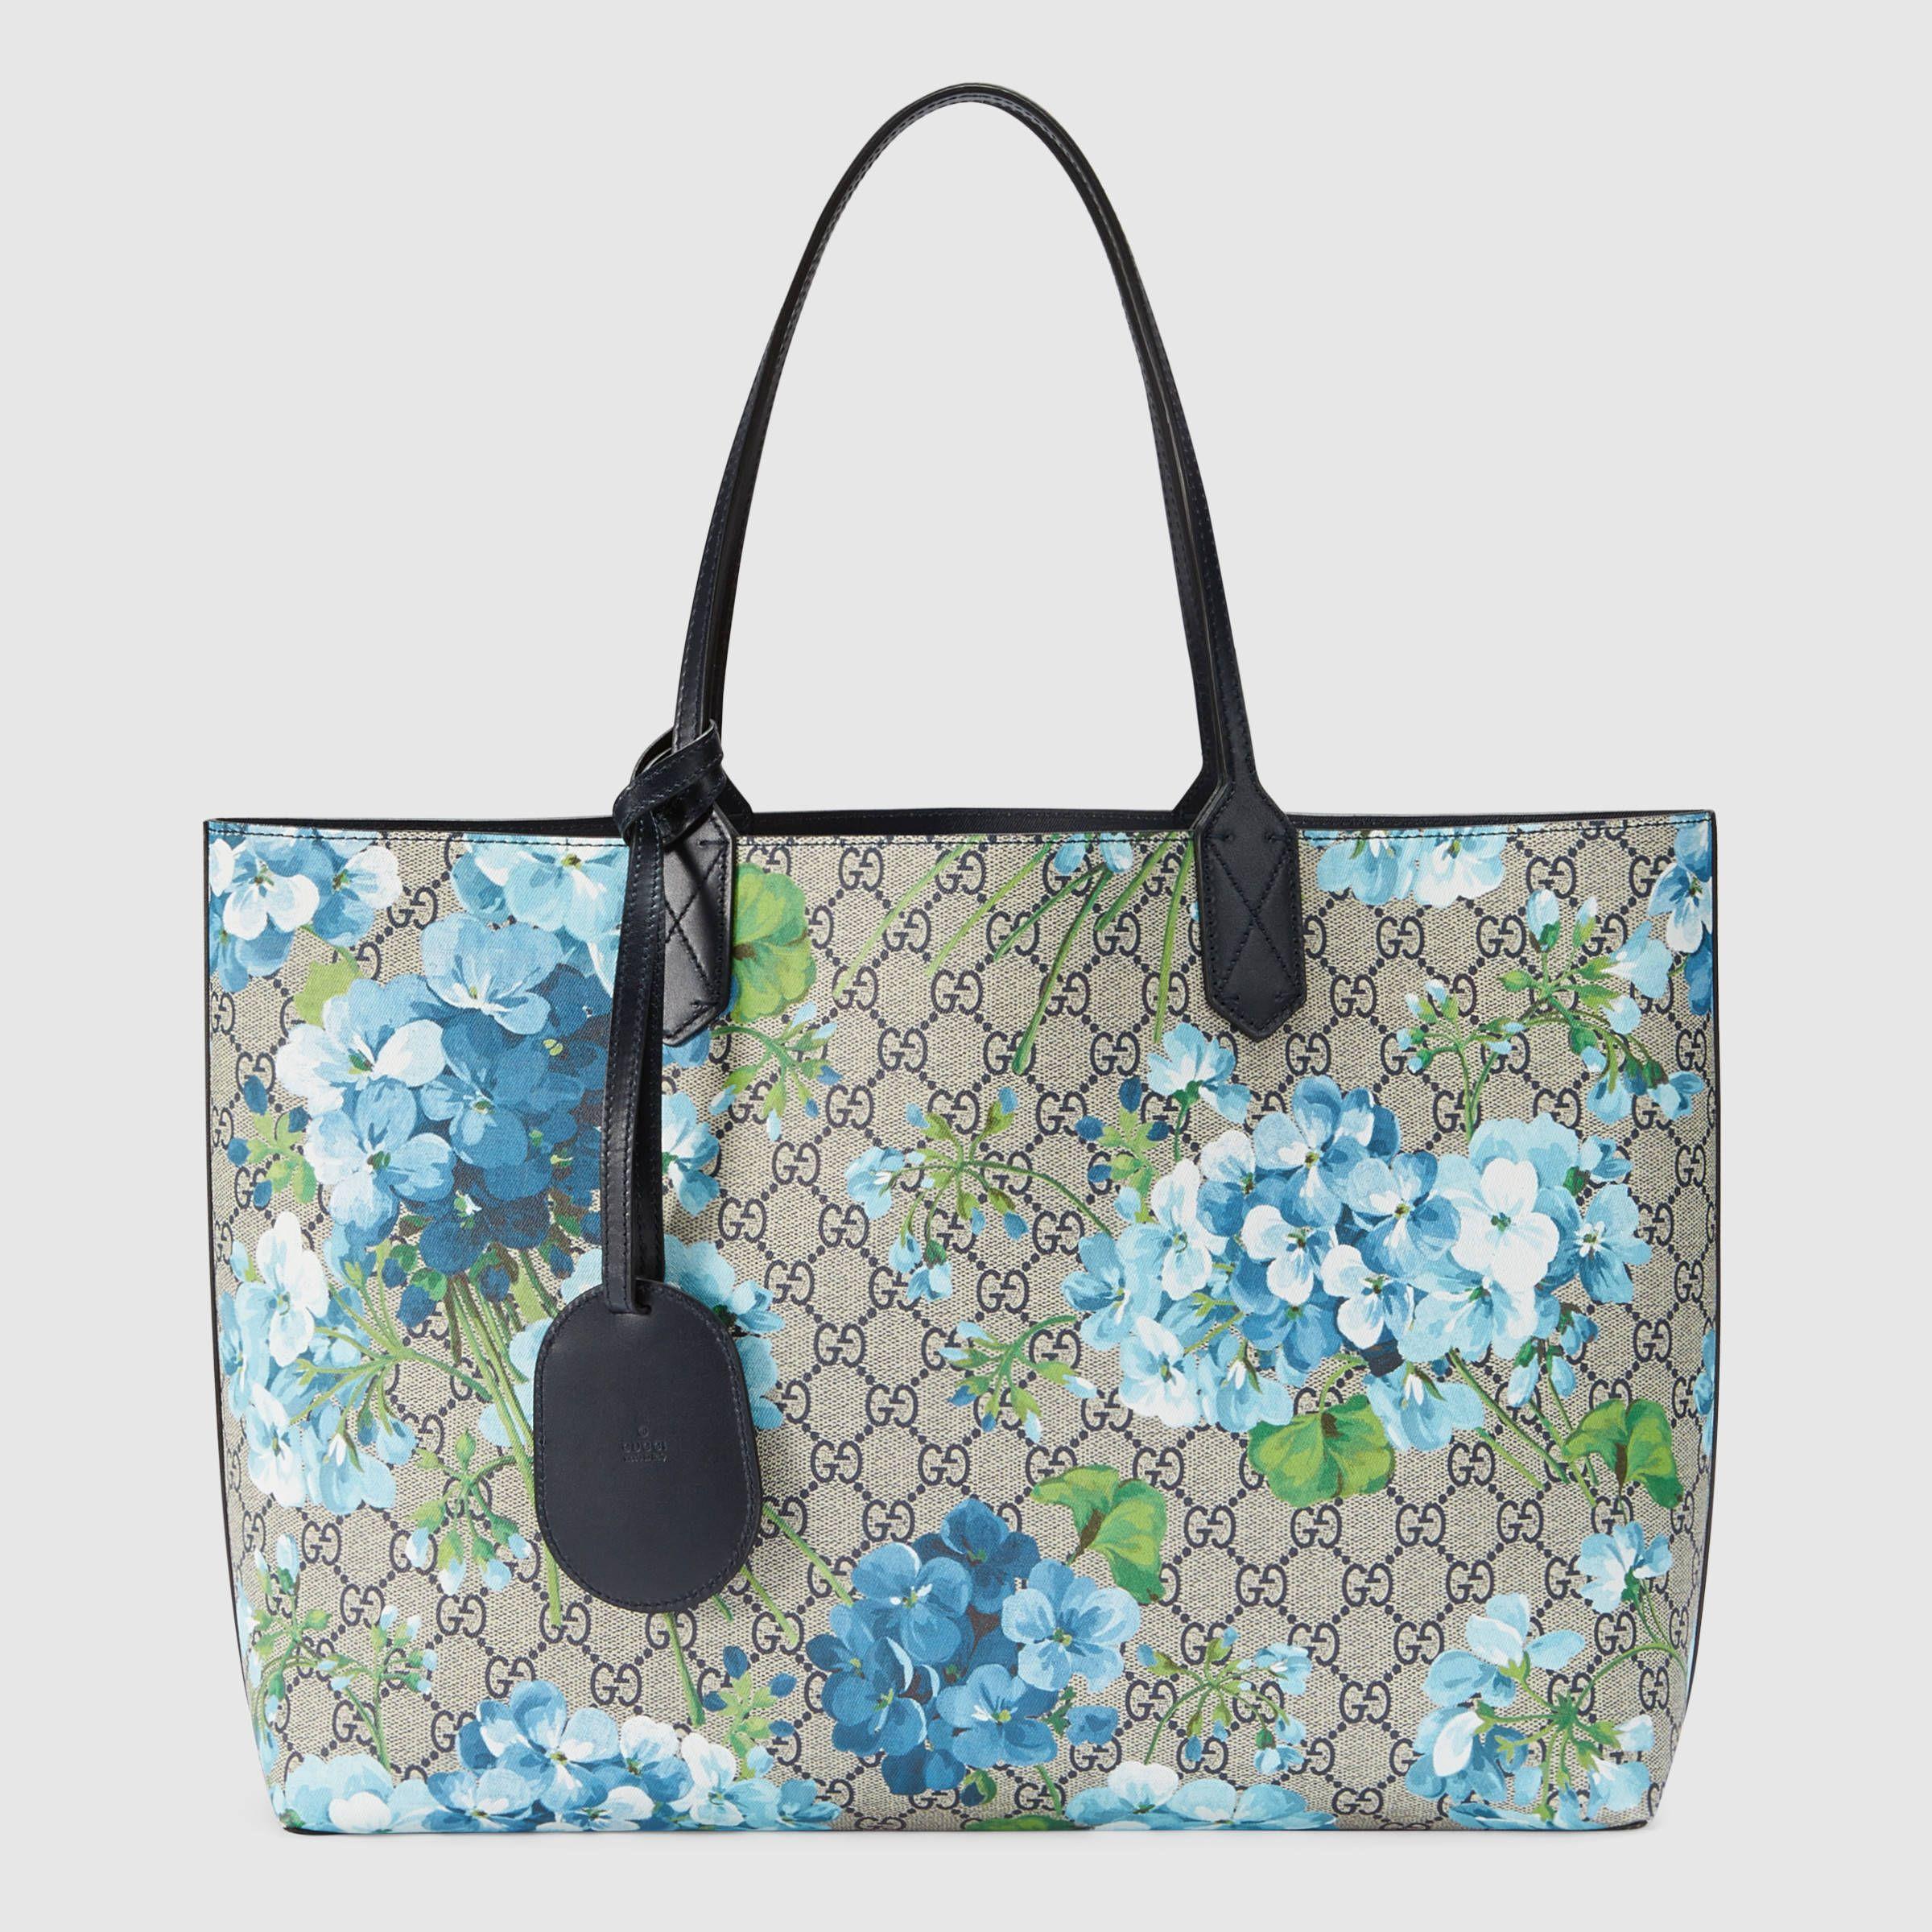 86368555907e Gucci Women - Reversible GG Blooms leather tote - 368568CU71X8499 ...